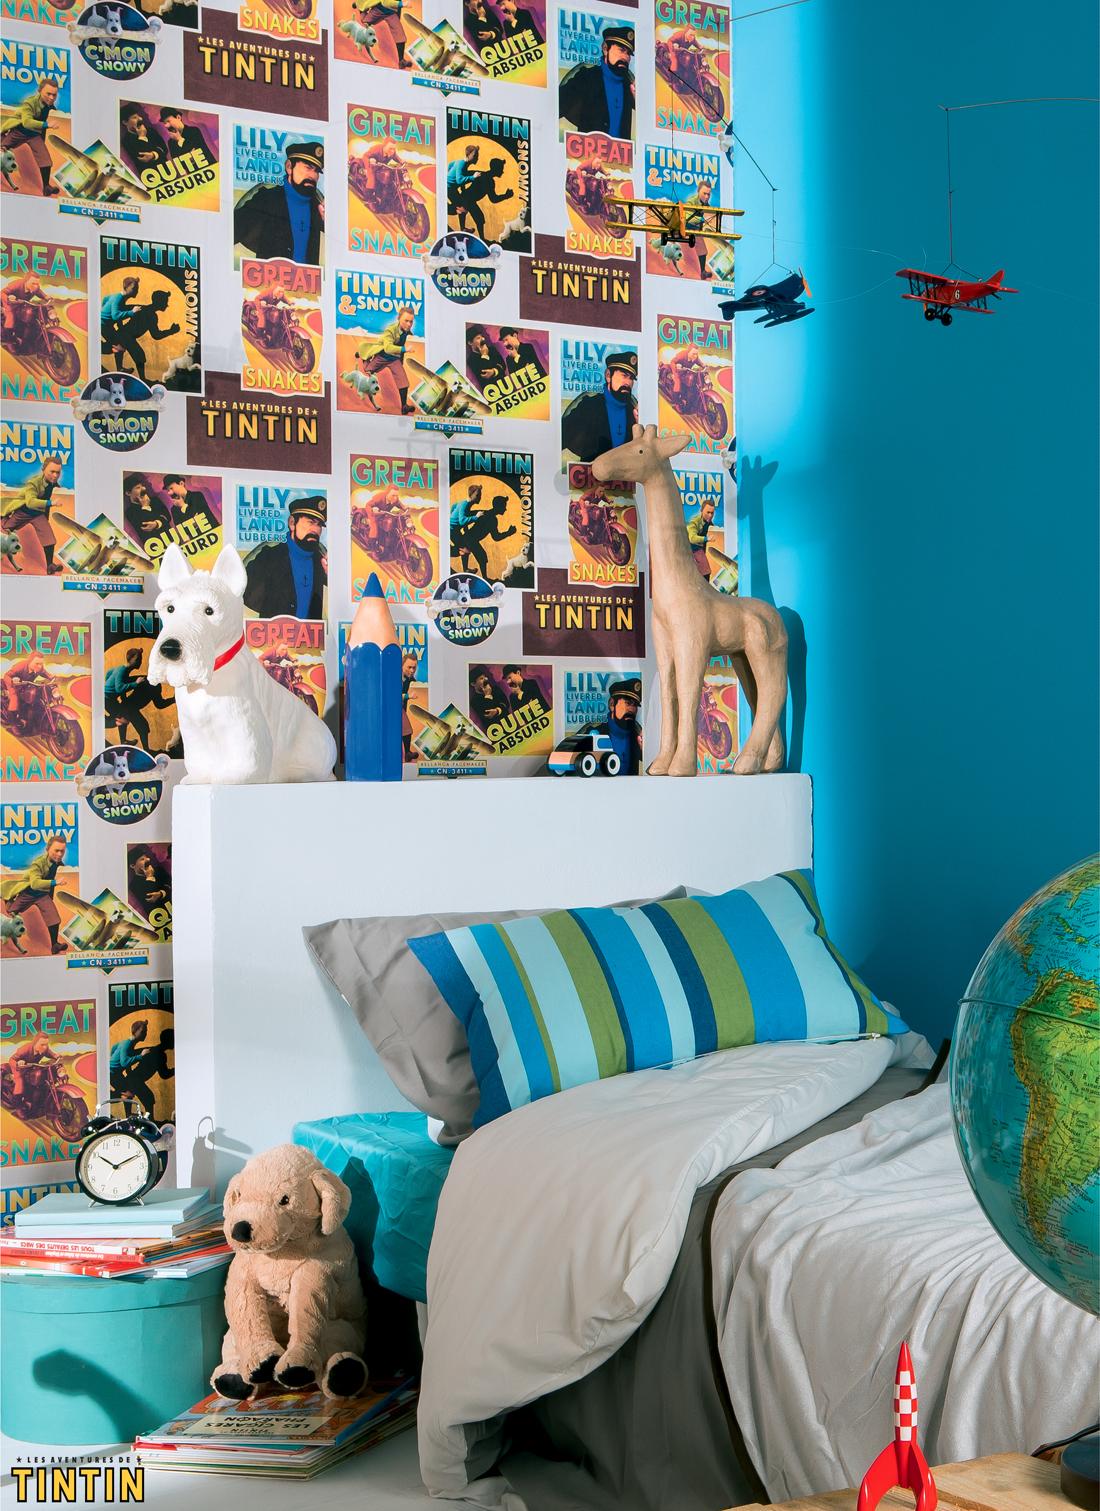 Papier Peint Tintin Et Milou decoration tintin et milou – oveetech